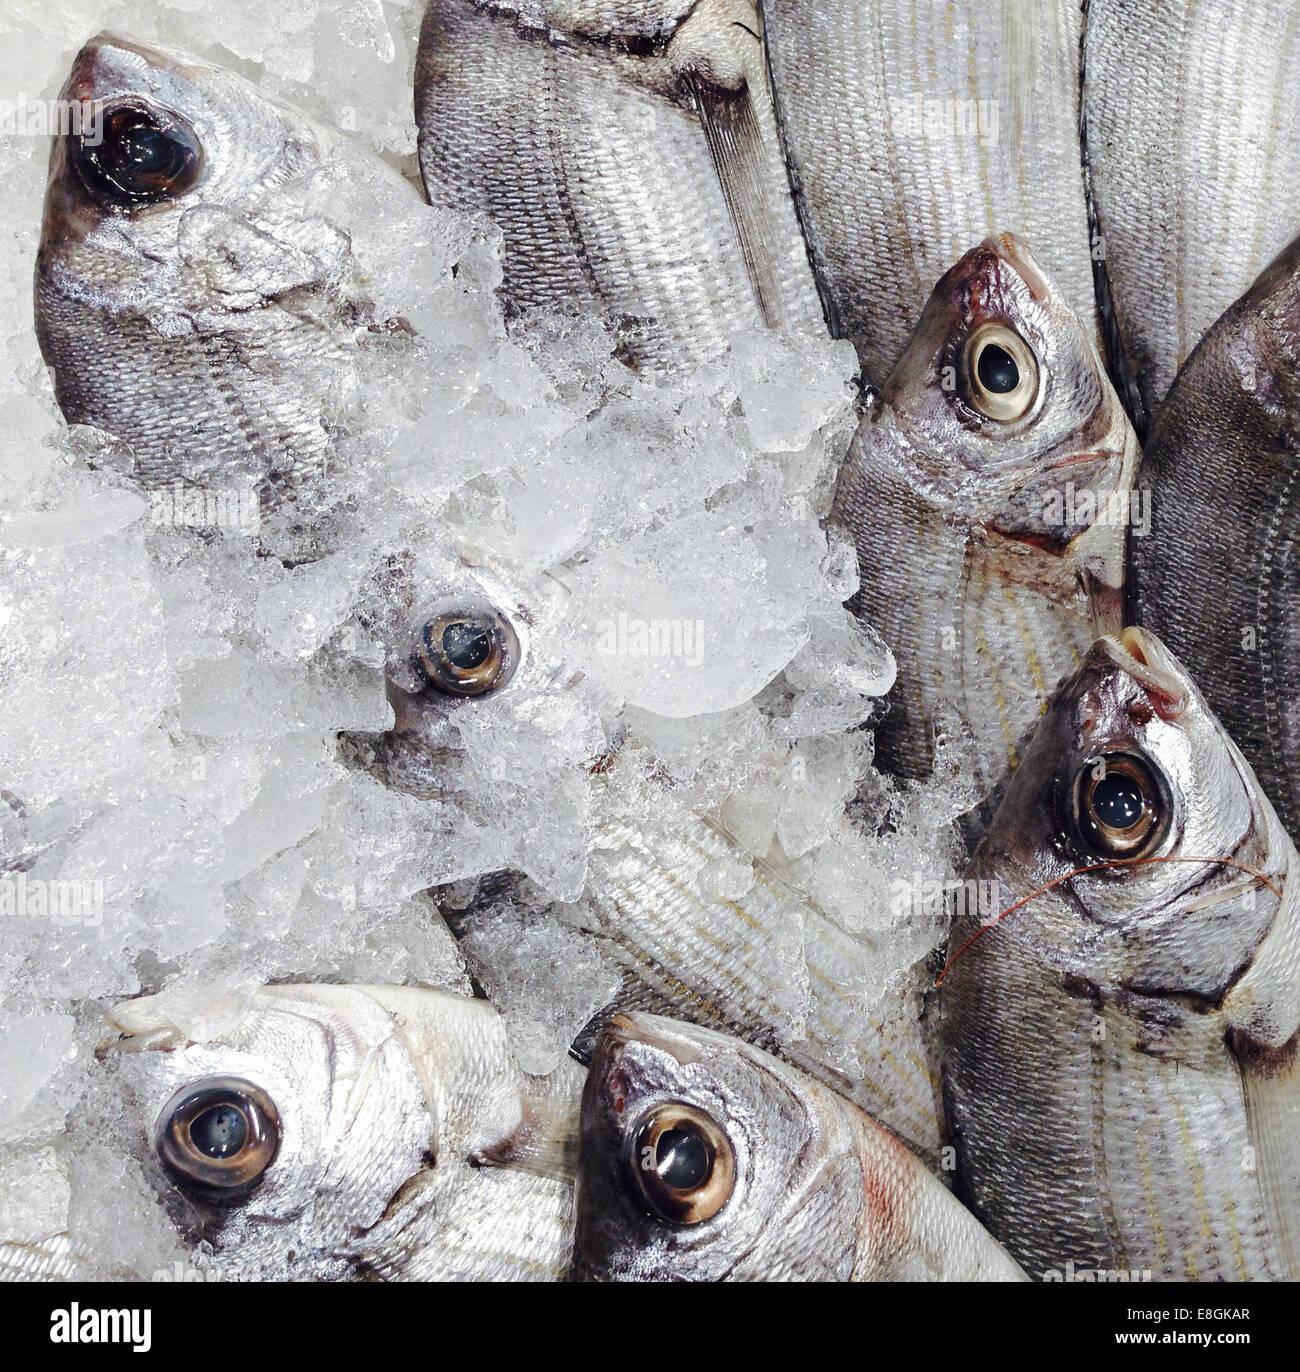 Dorada Fish At A Market In Spain - Stock Image